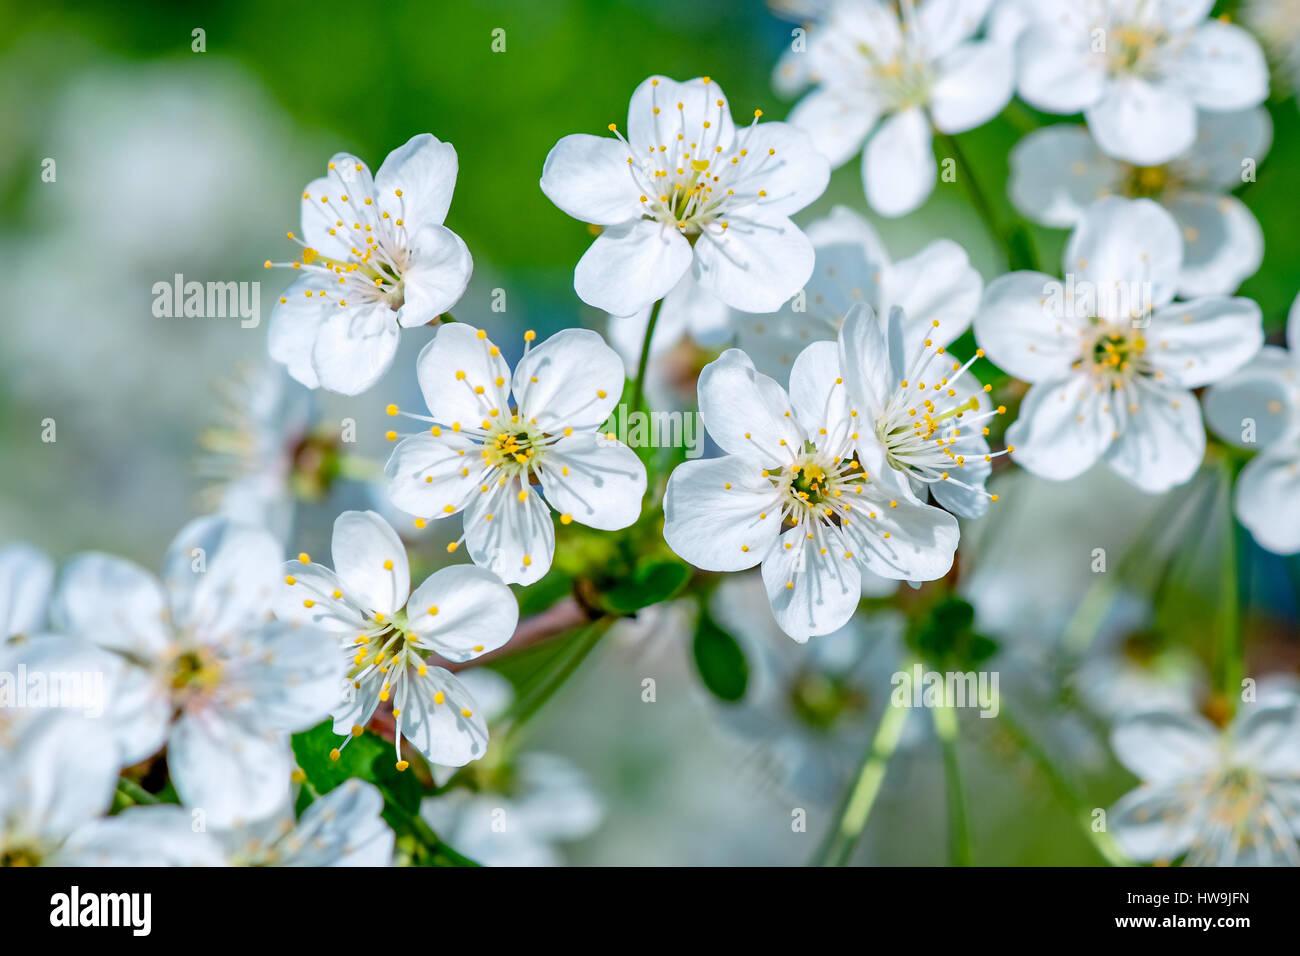 White flowers of a cherry tree in full bloom and blossom closeup white flowers of a cherry tree in full bloom and blossom closeup view joy and beauty of spring season mightylinksfo